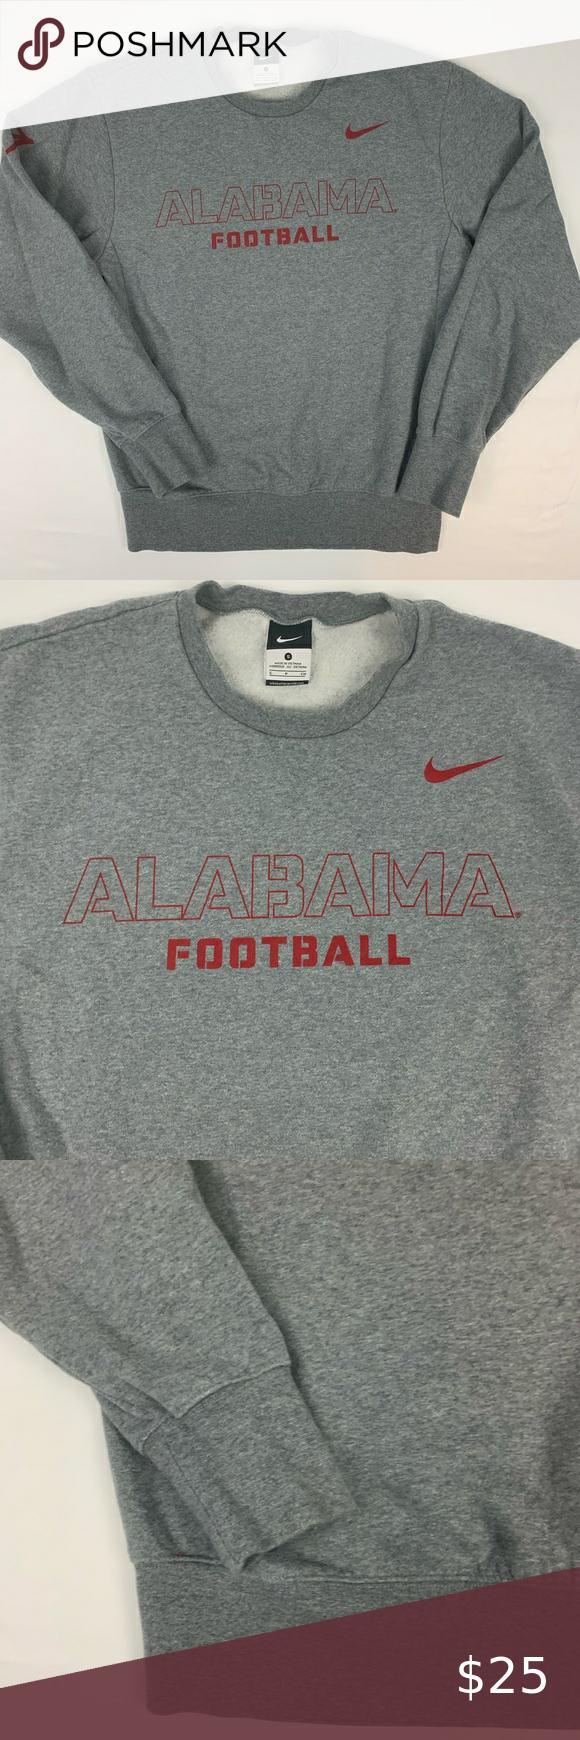 Alabama Crimson Tide Nike Crewneck Sweatshirt Nike Crewneck Sweatshirt Sweatshirts Crew Neck Sweatshirt [ 1740 x 580 Pixel ]